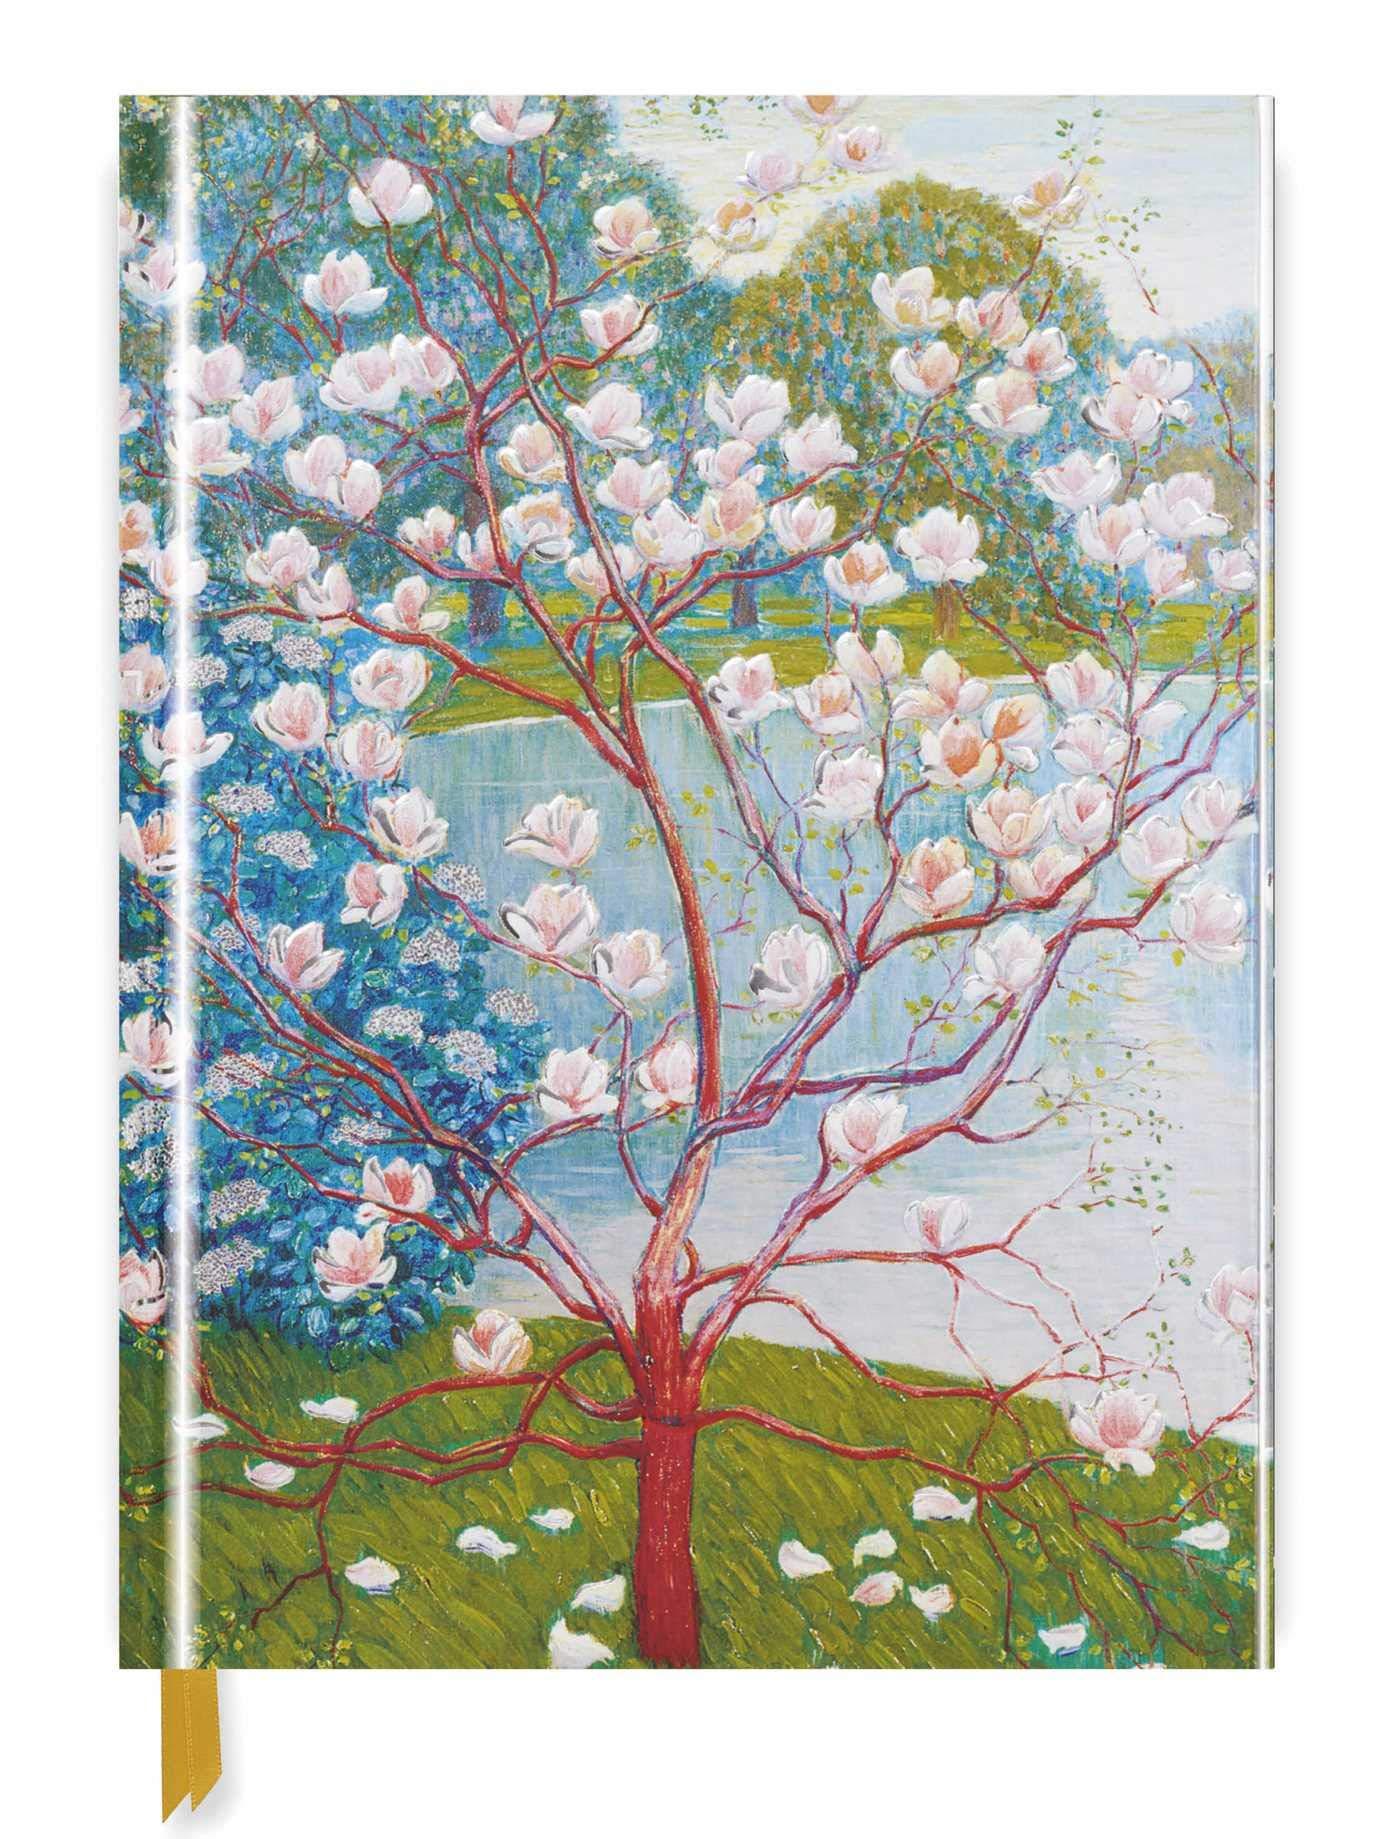 Wilhelm List Magnolia Tree Blank Sketch Book Luxury Sketch Books Flame Tree Studio 9781786641328 Amazon Com Books